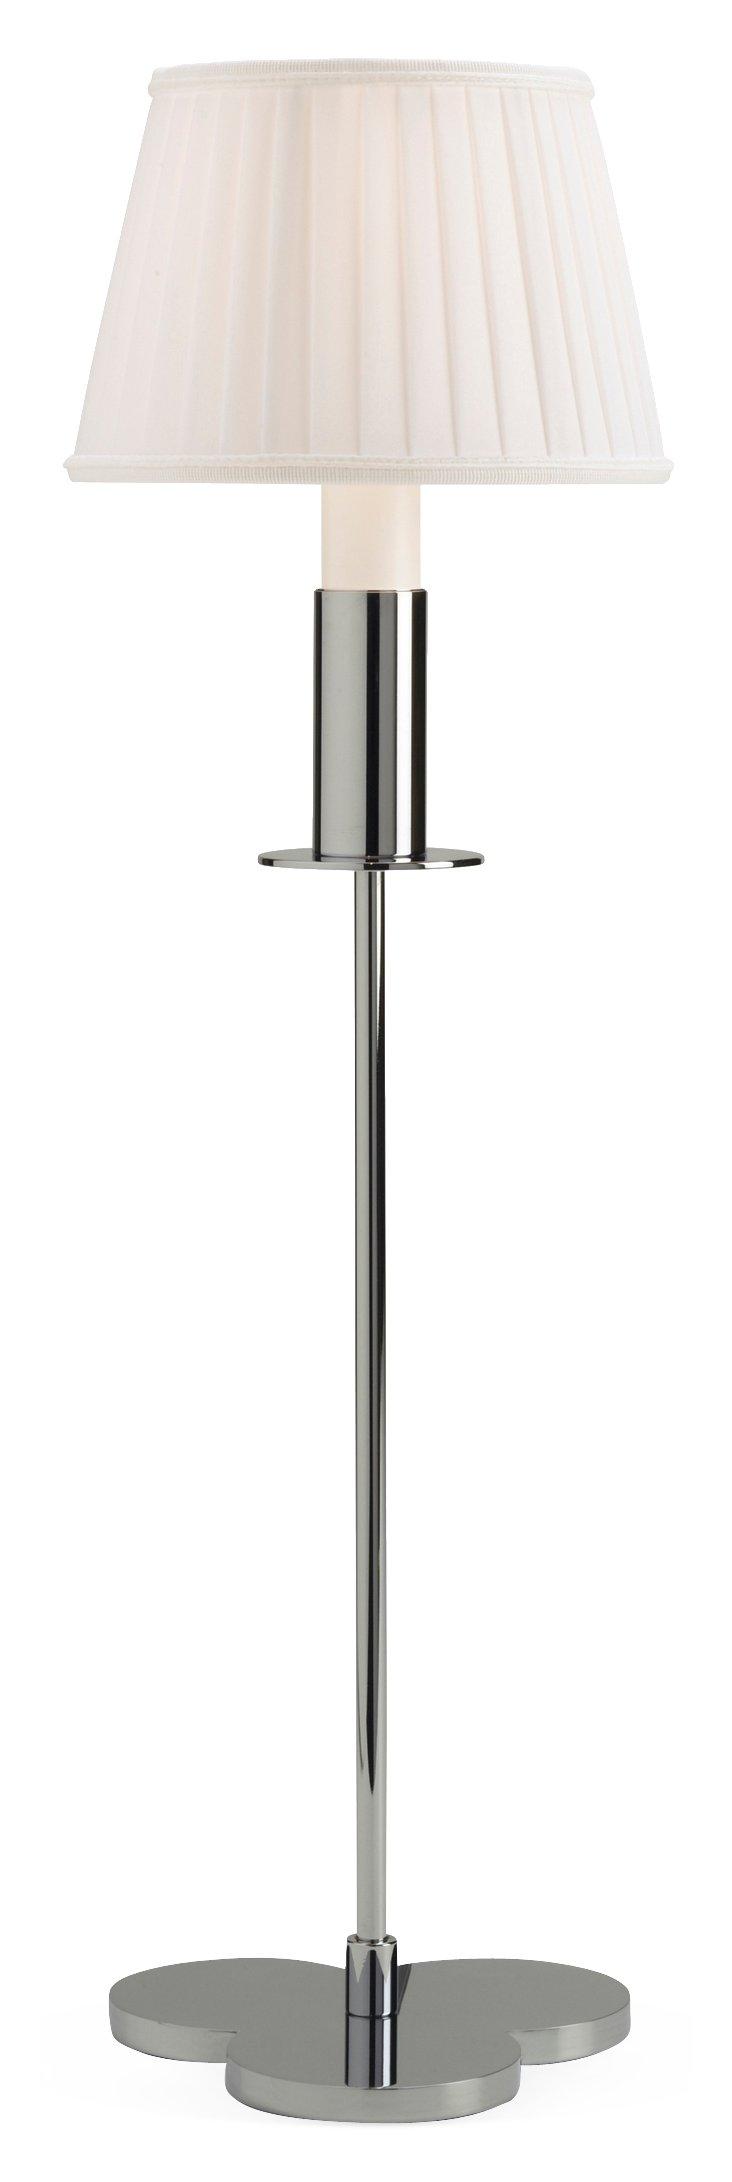 "Petite Champs 23"" Table Lamp, Chrome"